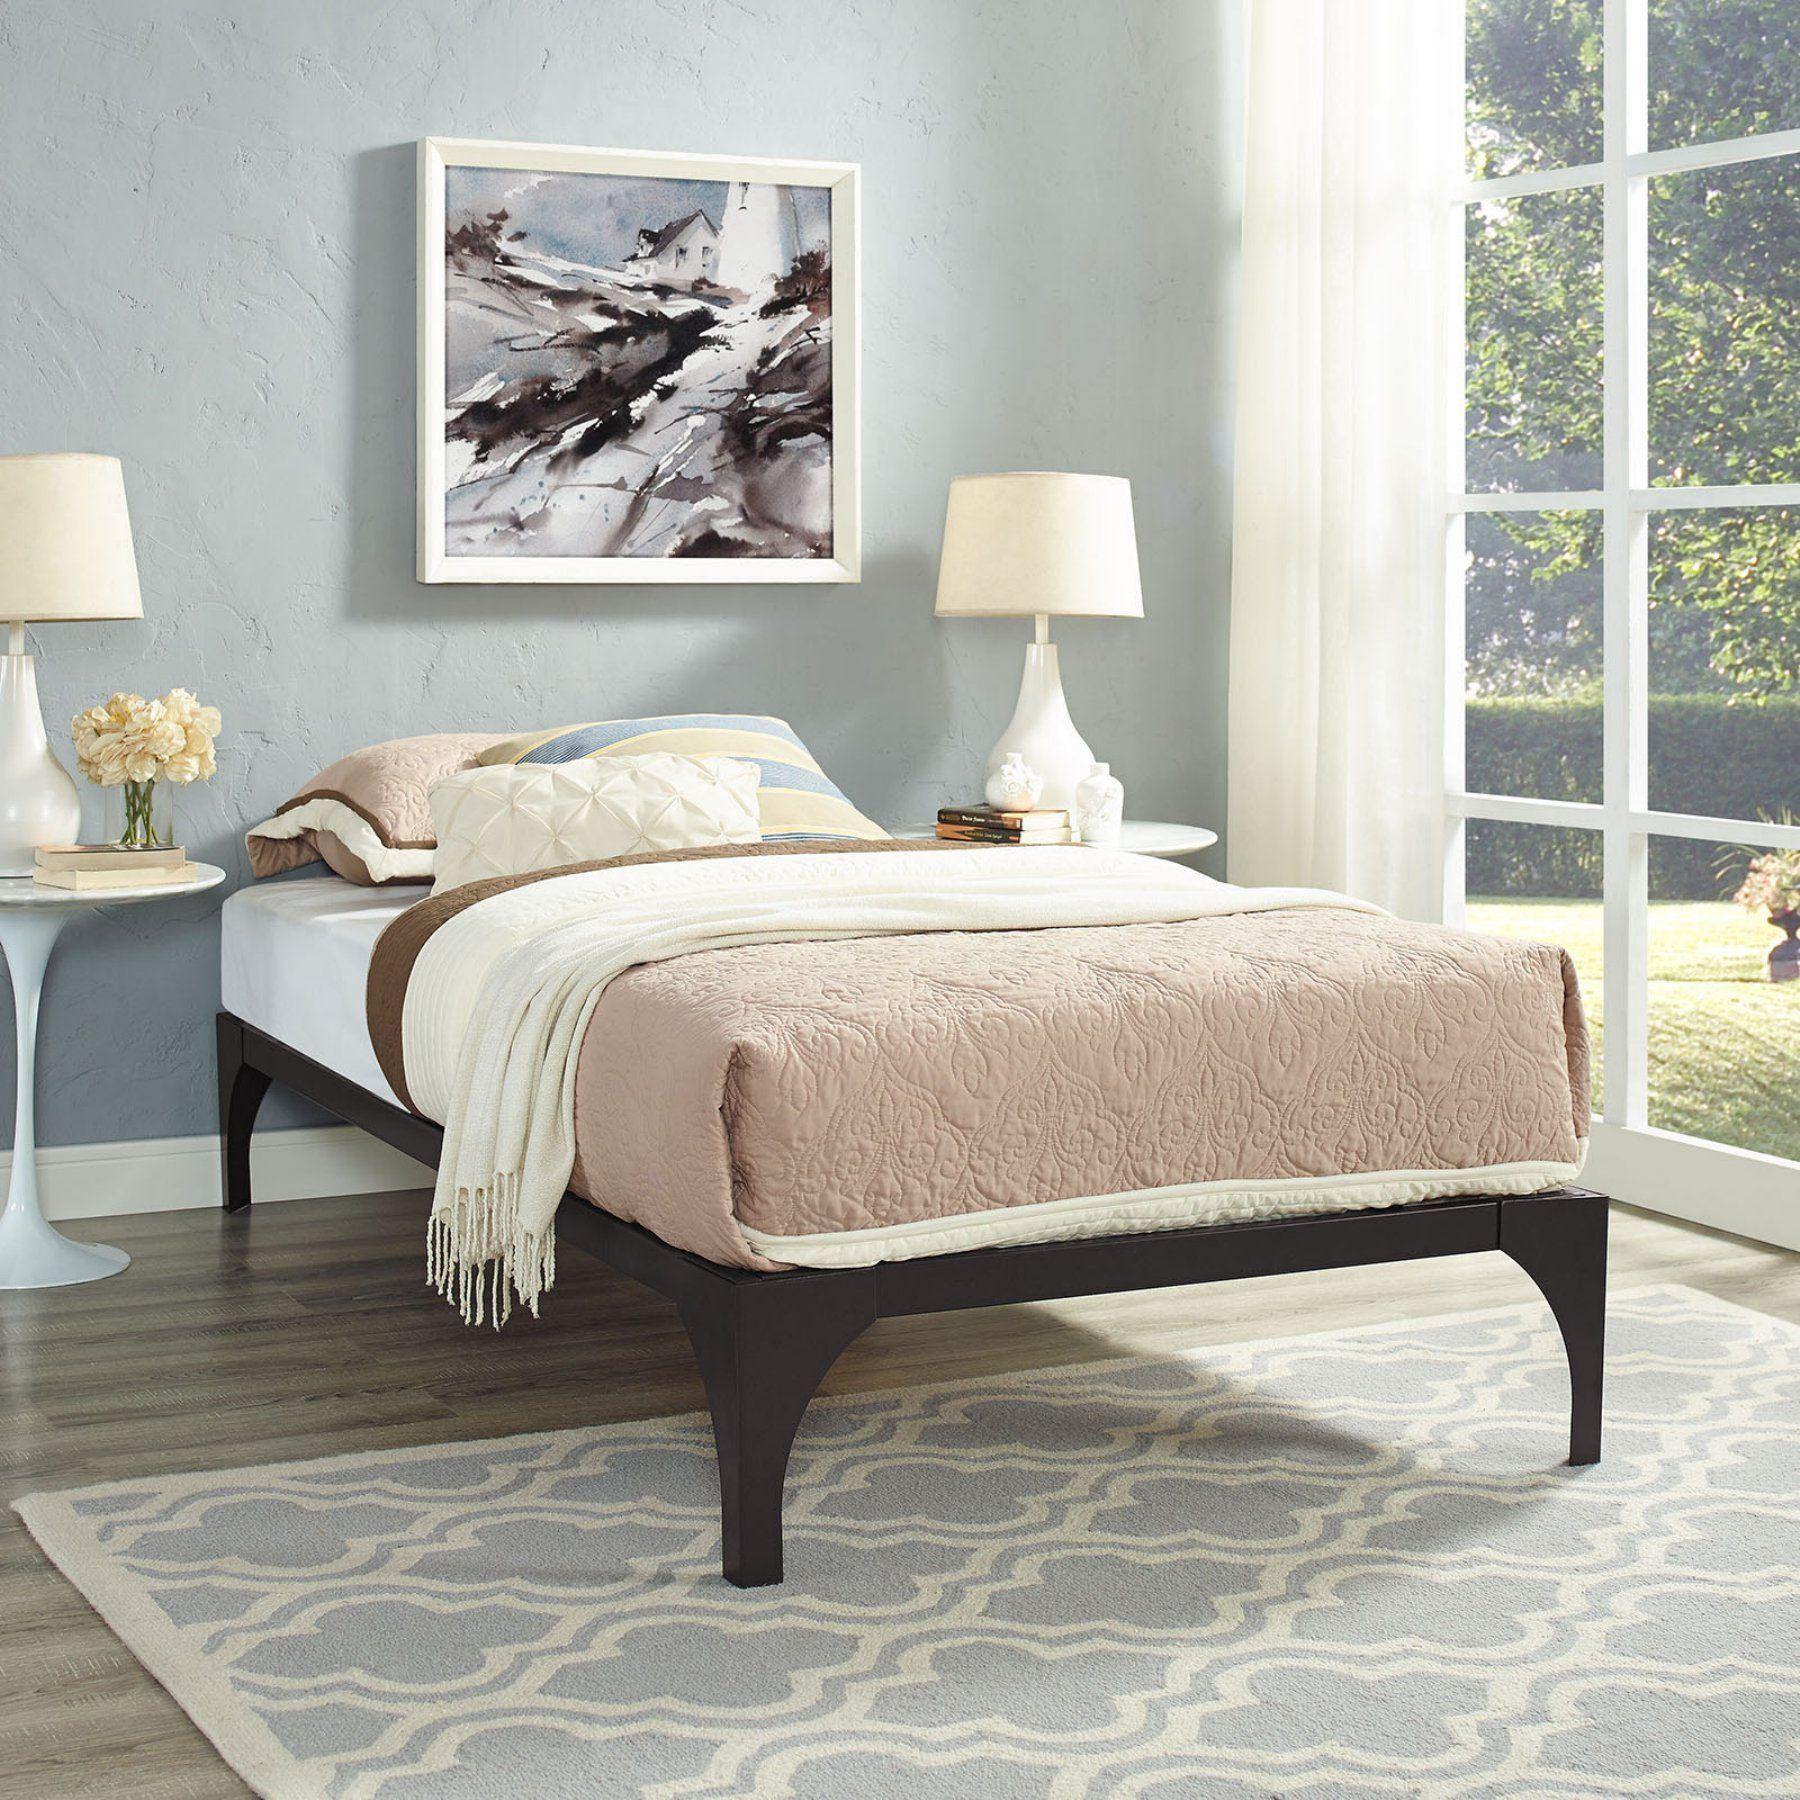 Modway Ollie Metal Platform Bed - MOD-5431-GRY